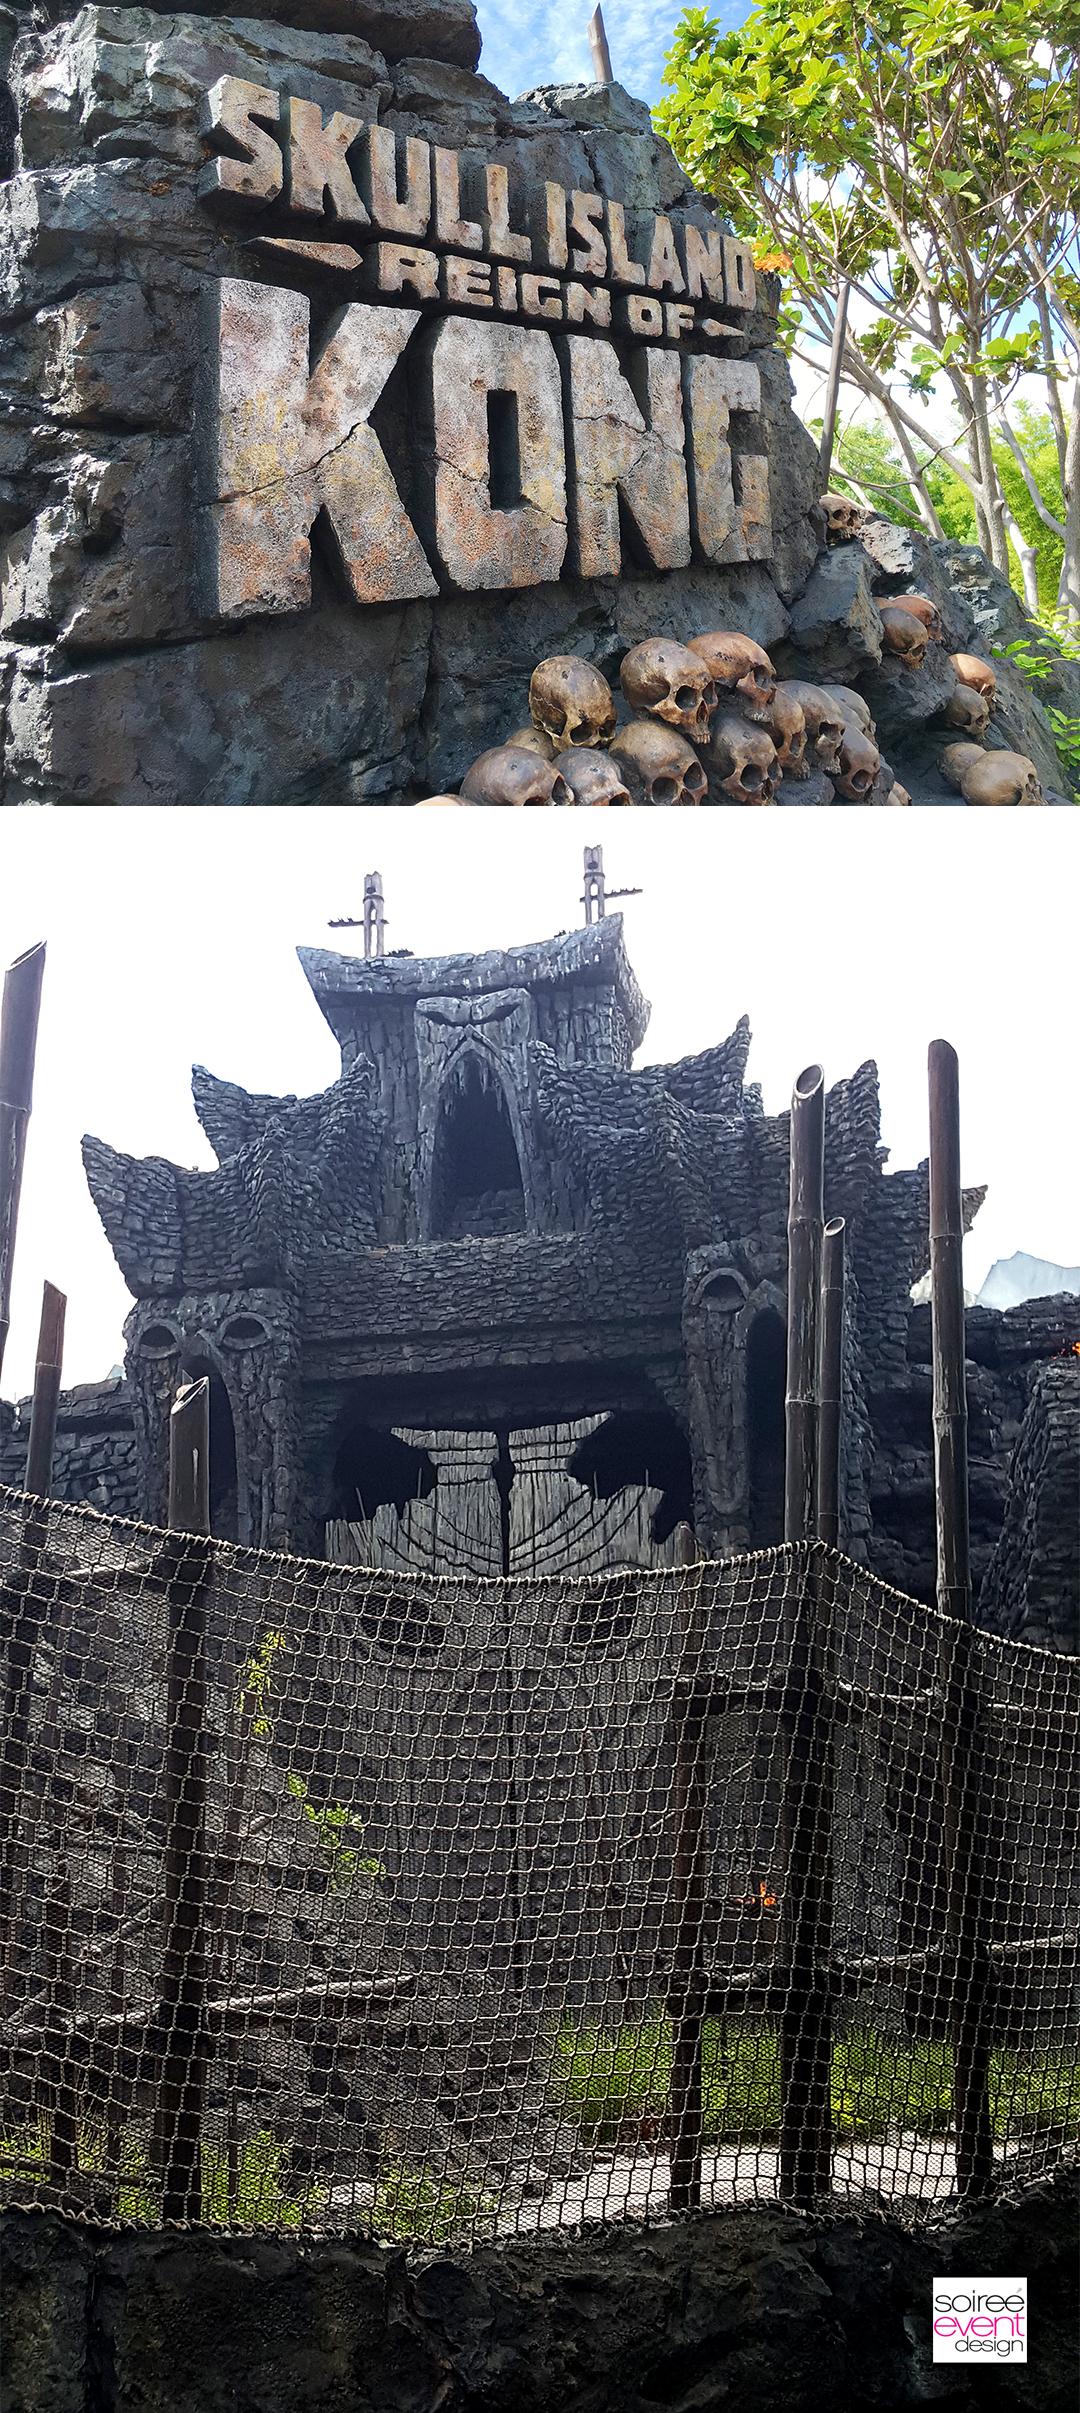 reign-of-kong-at-universal-orlando-resort